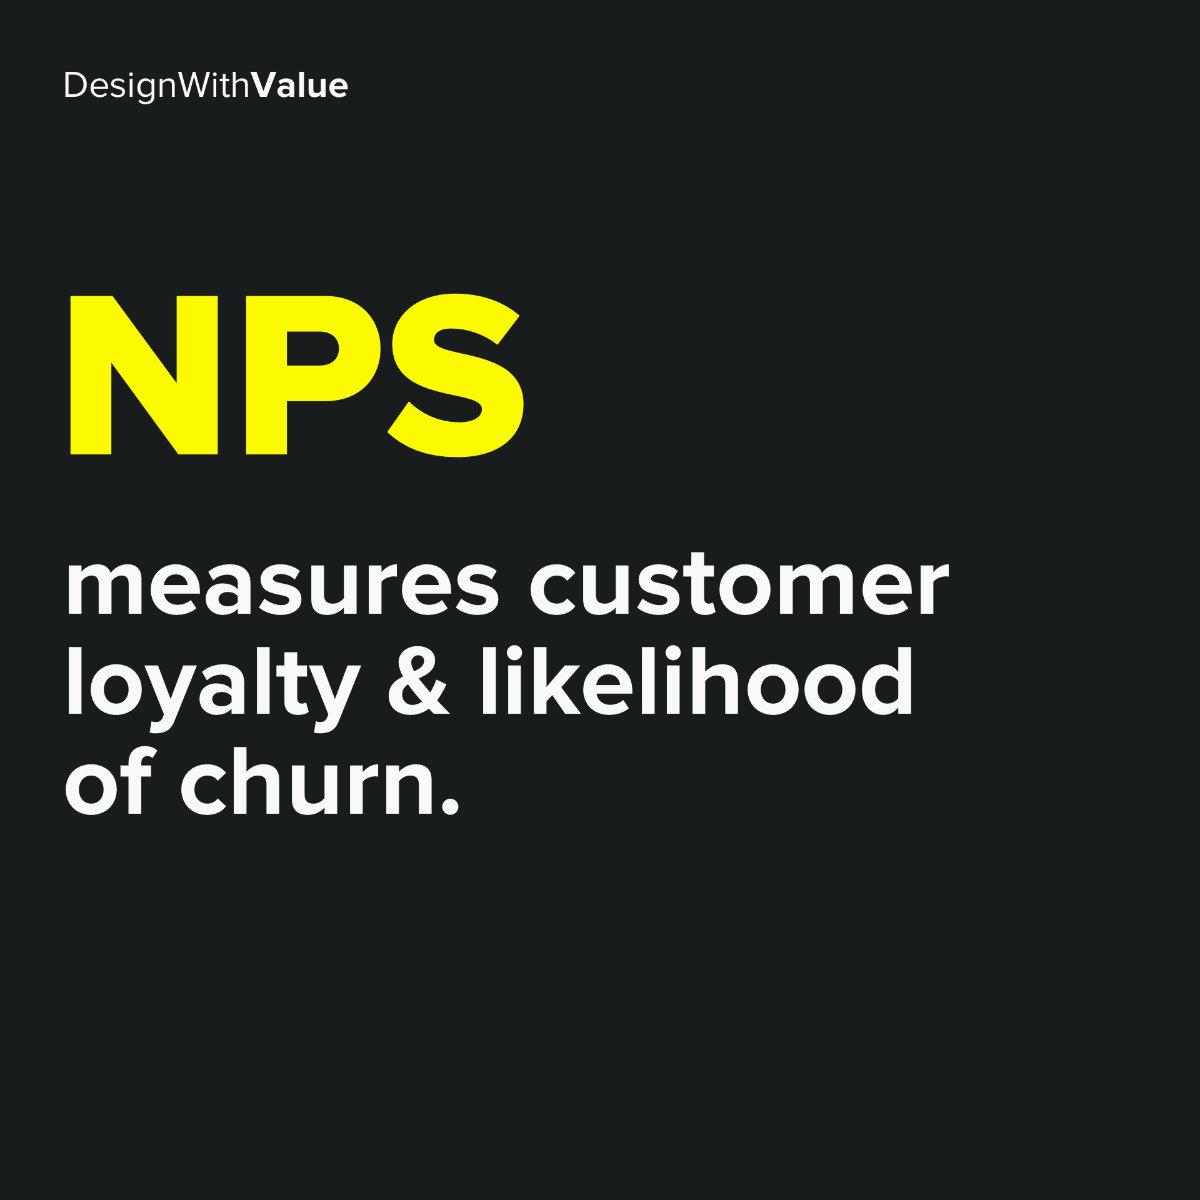 NPS measures customer loyalty and likelihood of churn